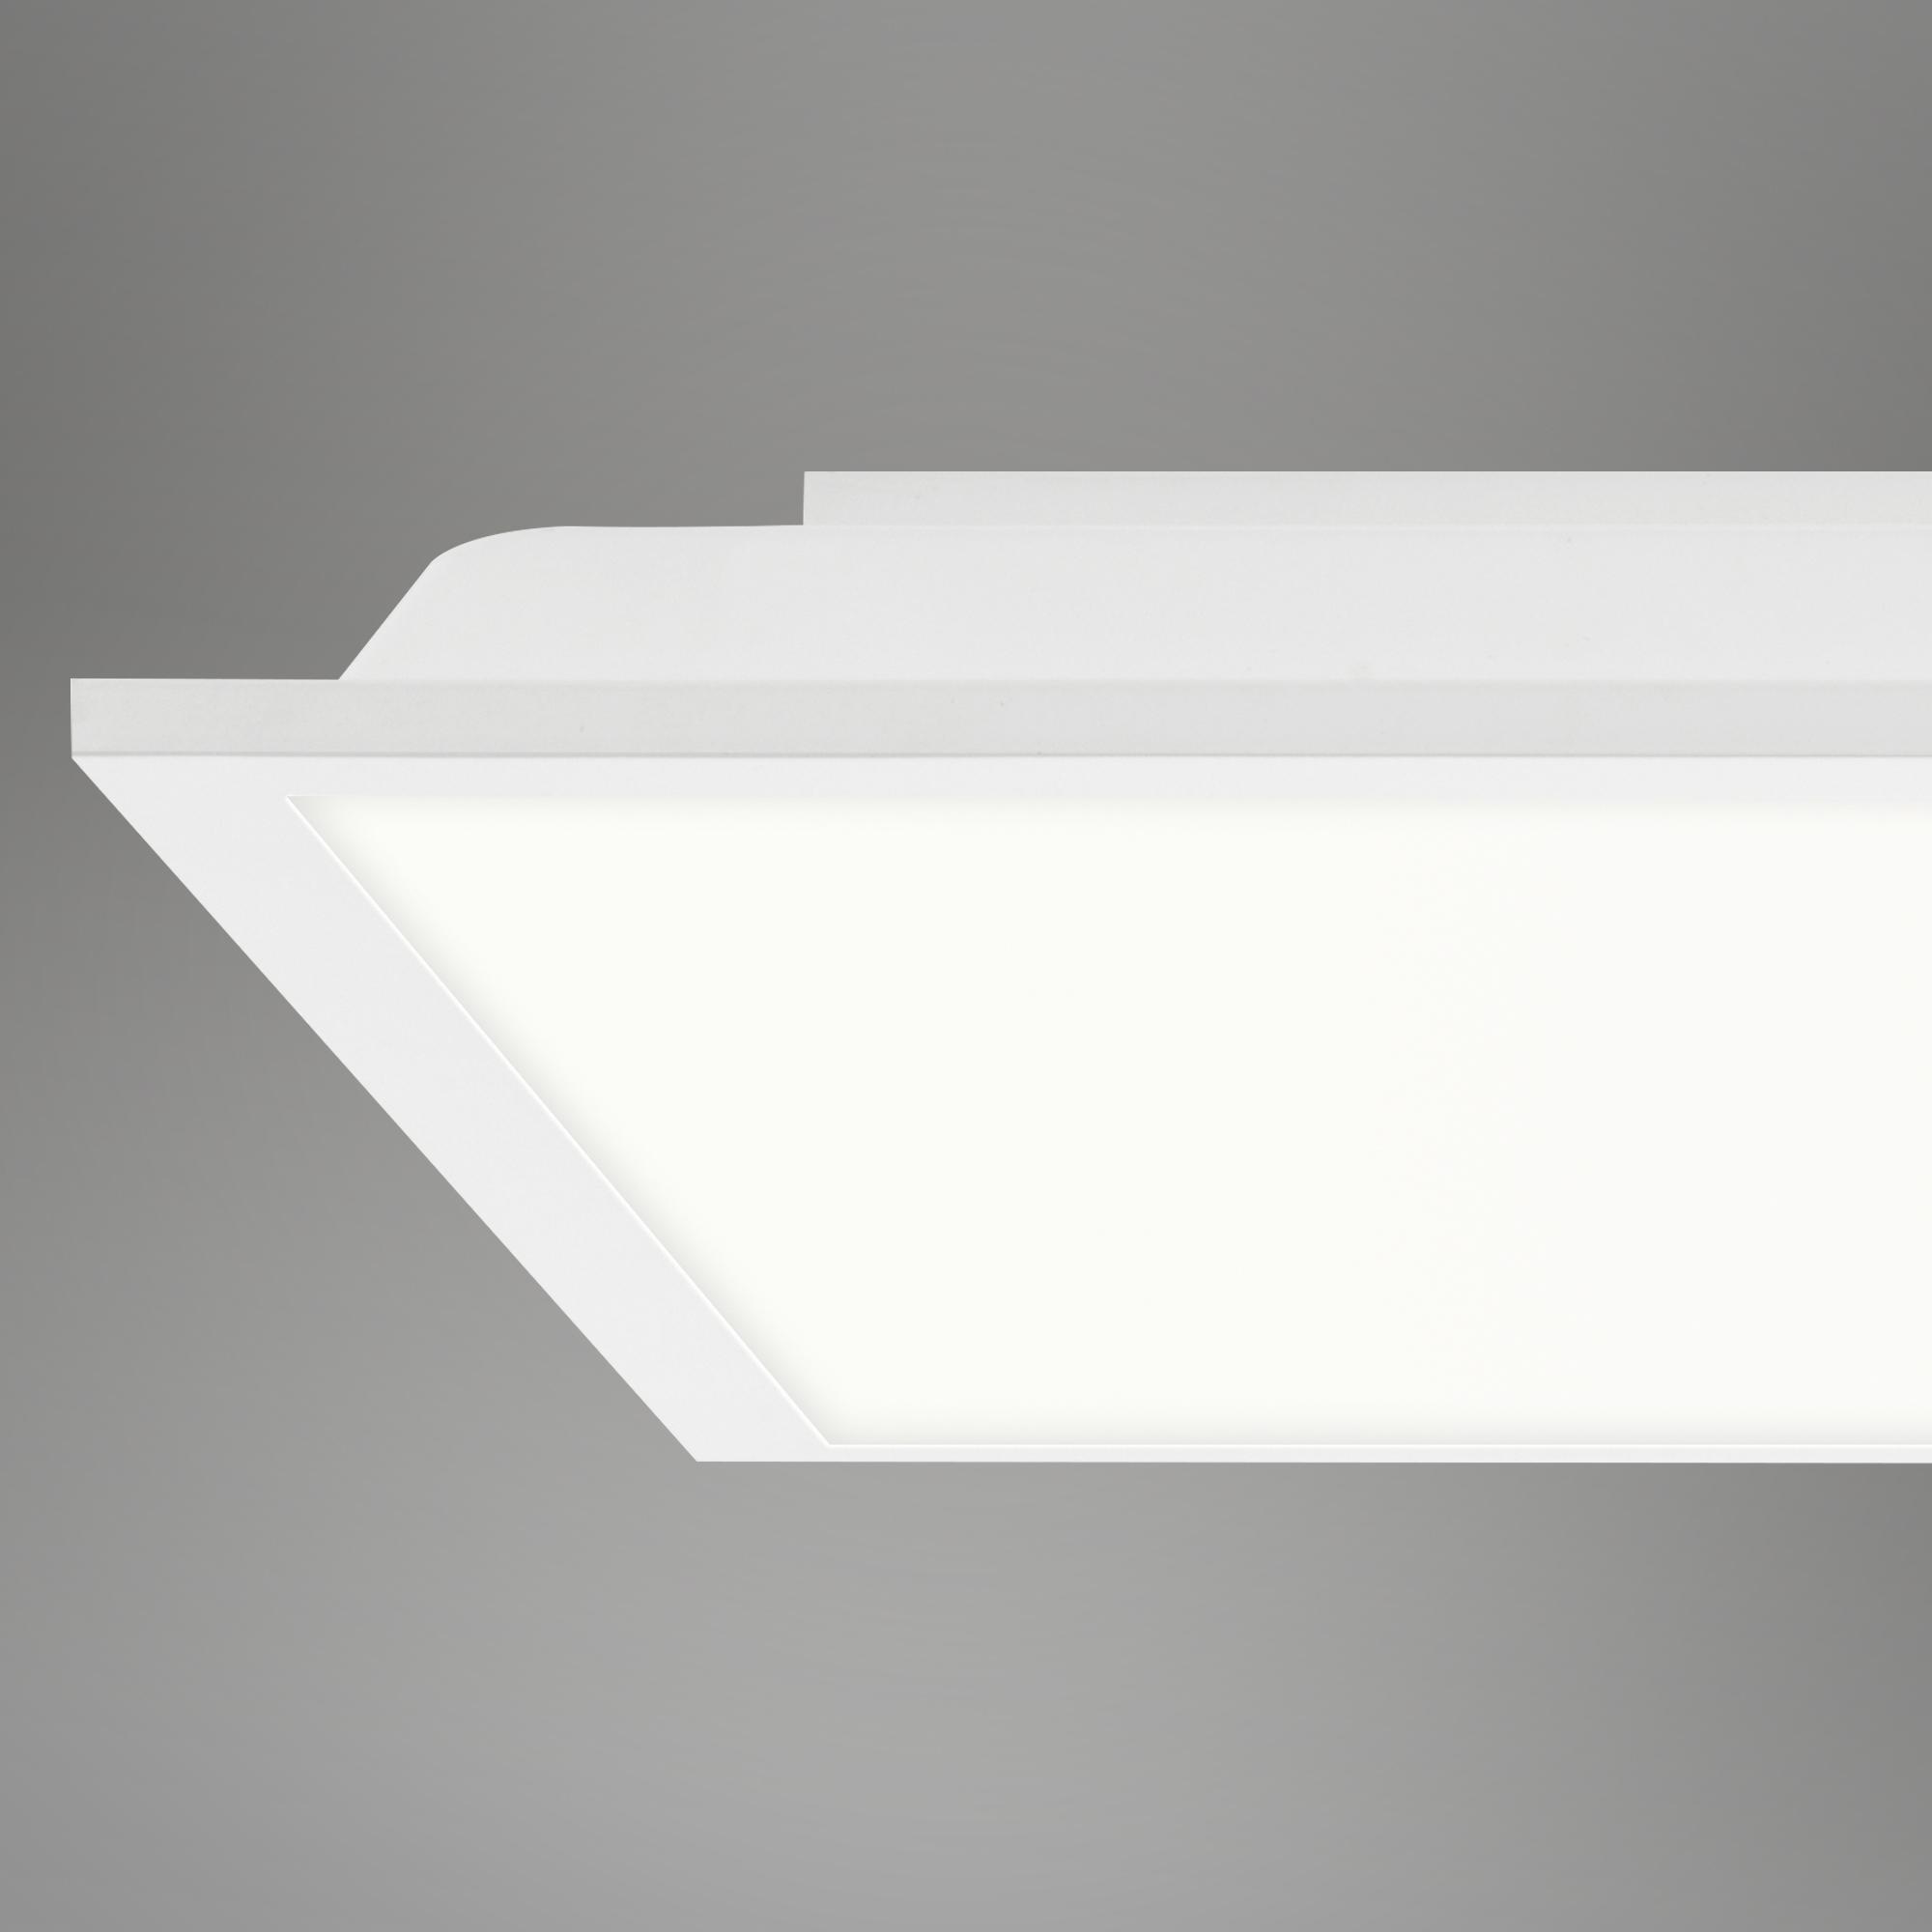 SMART LED Panel, 59,5 cm, 3400 lm, 40 WATT, Weiß